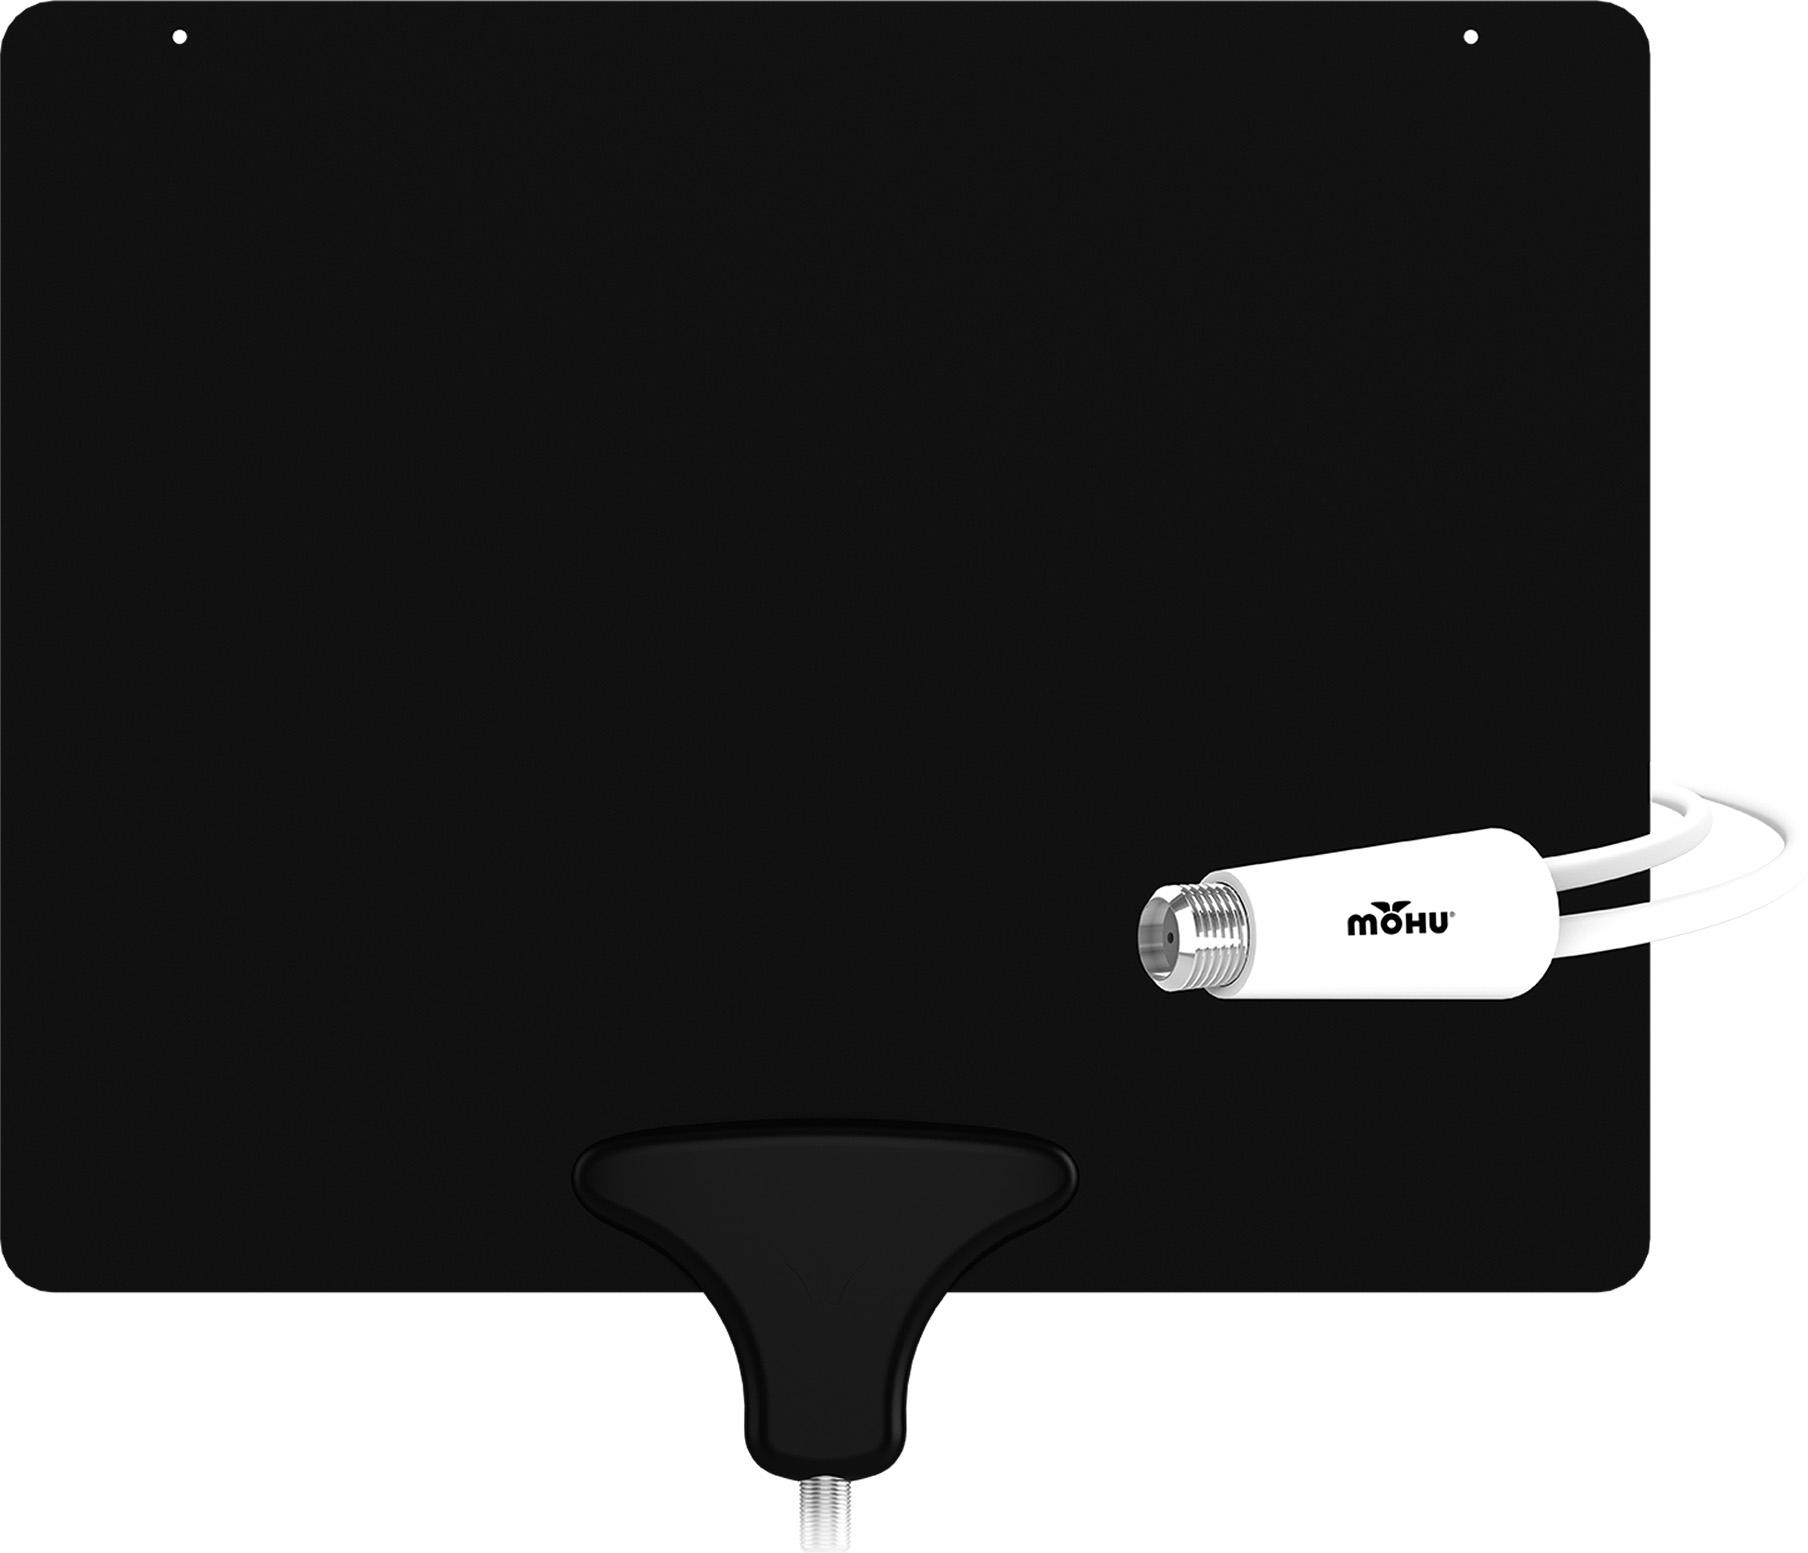 Mohu Leaf 50 HDTV Antenna